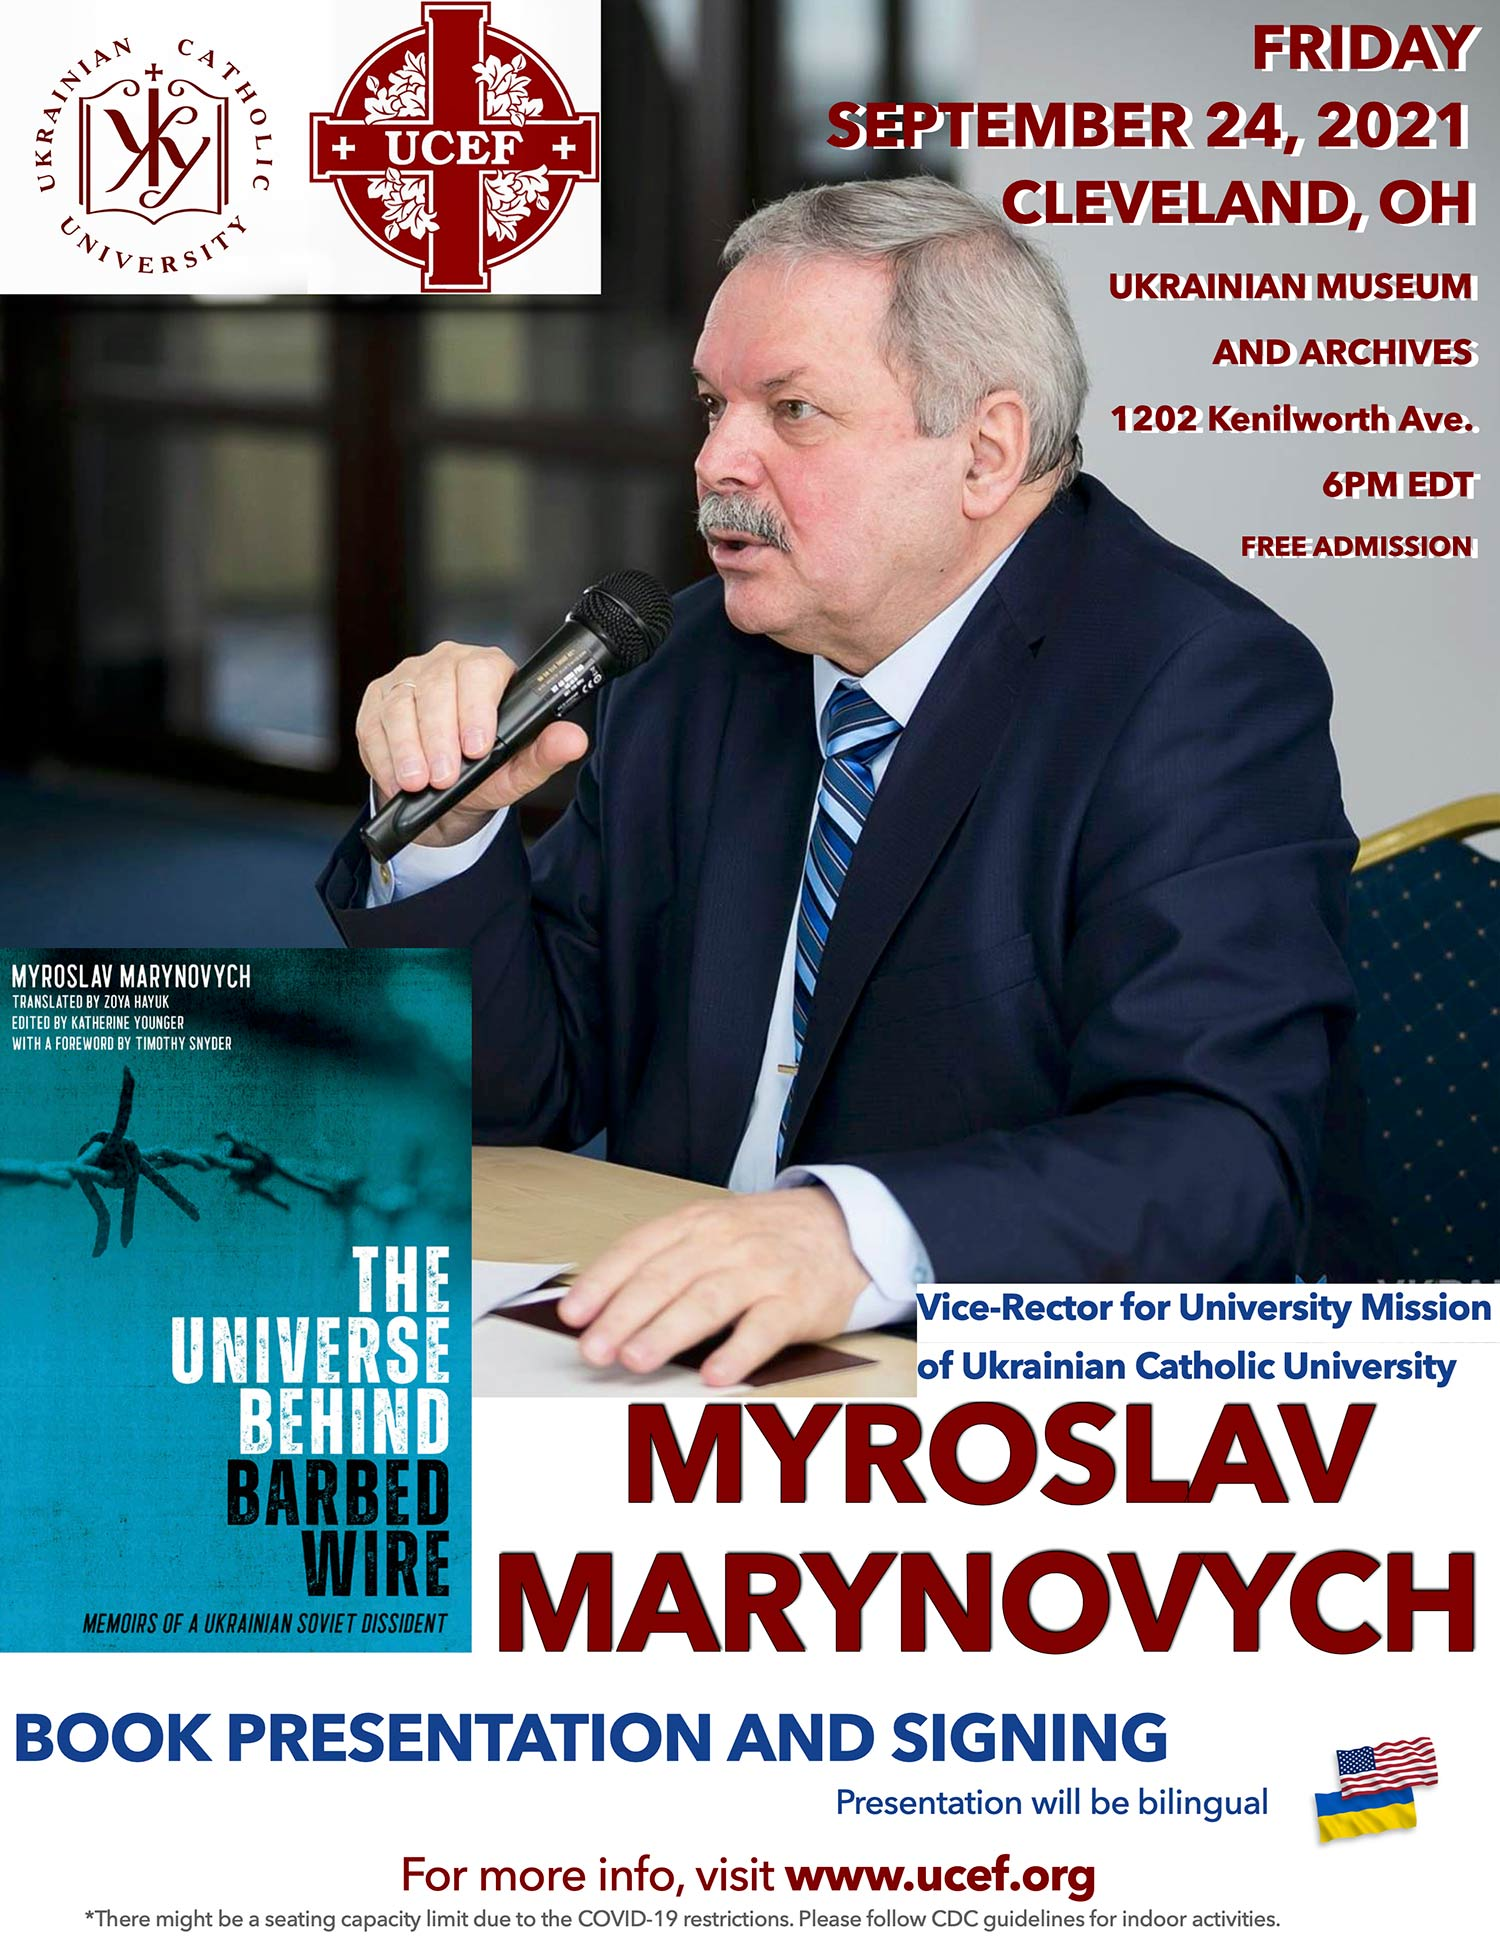 Myroslav Marynovych – Book Presentation and Signing